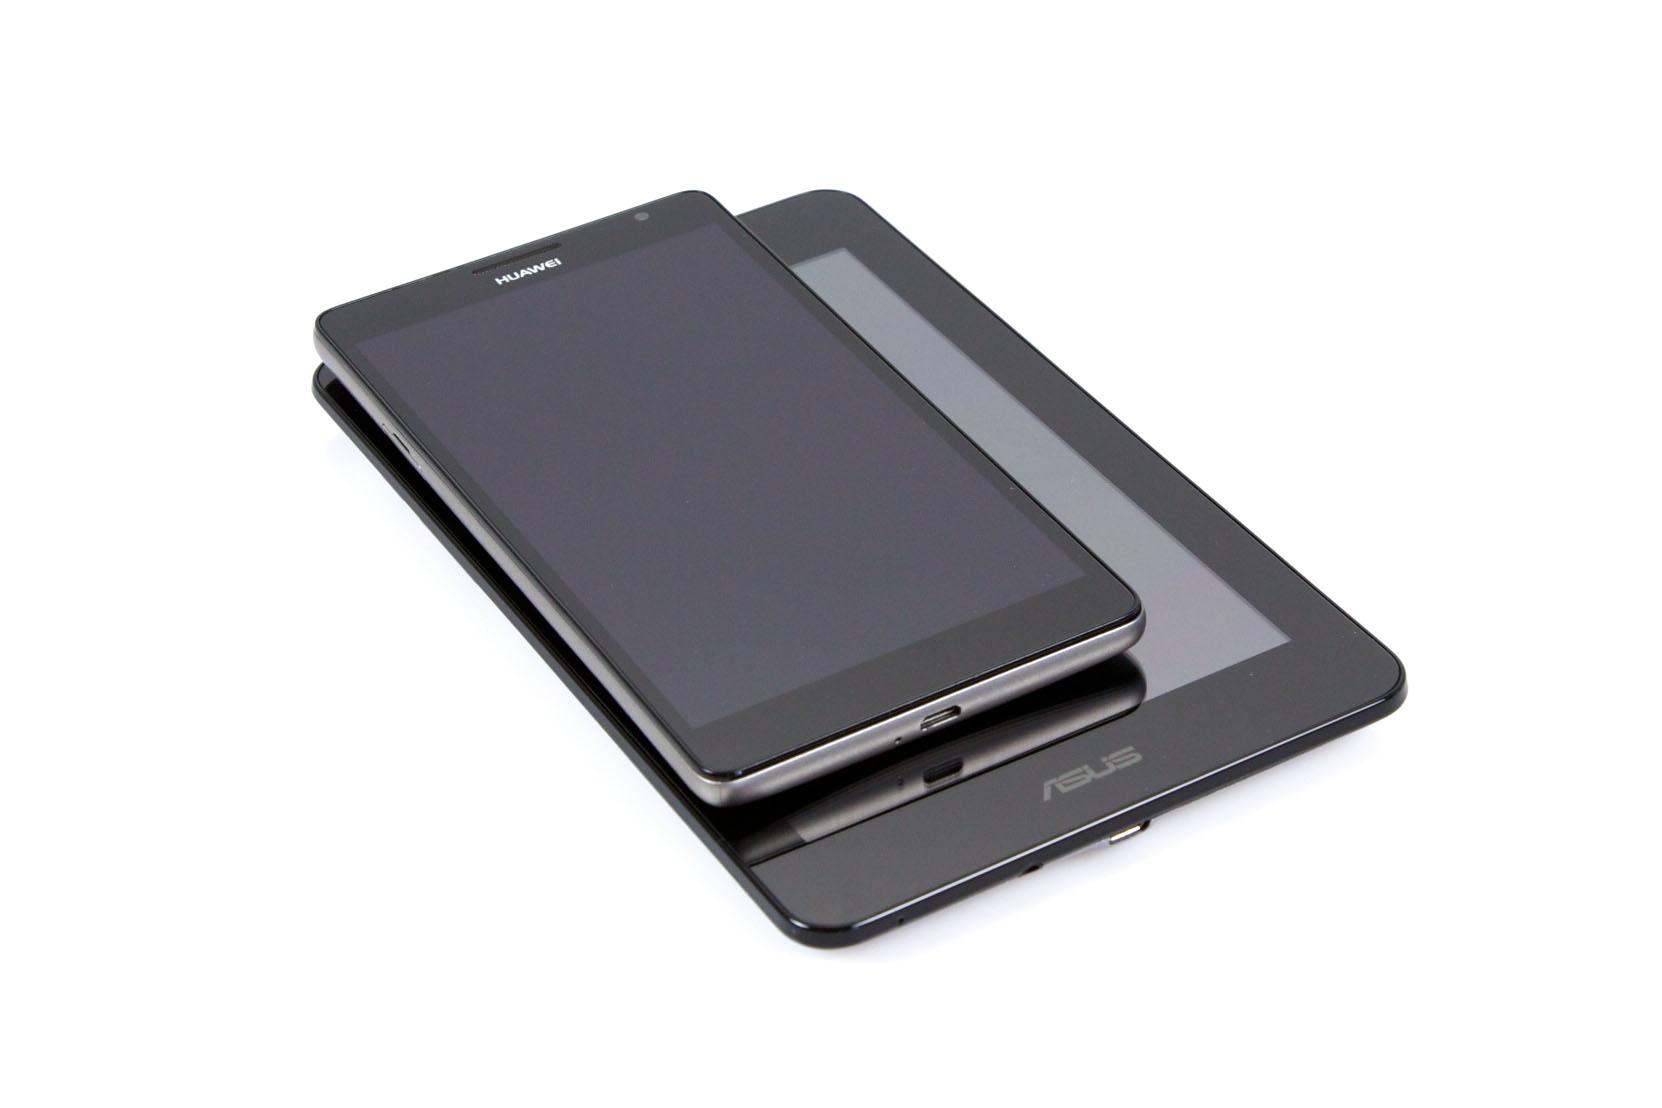 Huawei Ascend Mate im Test: Groß in fast jeder Hinsicht - Das Ascend Mate ist deutlich kompakter als das Asus Fonepad. (Bild: Nina Sebayang/Golem.de)